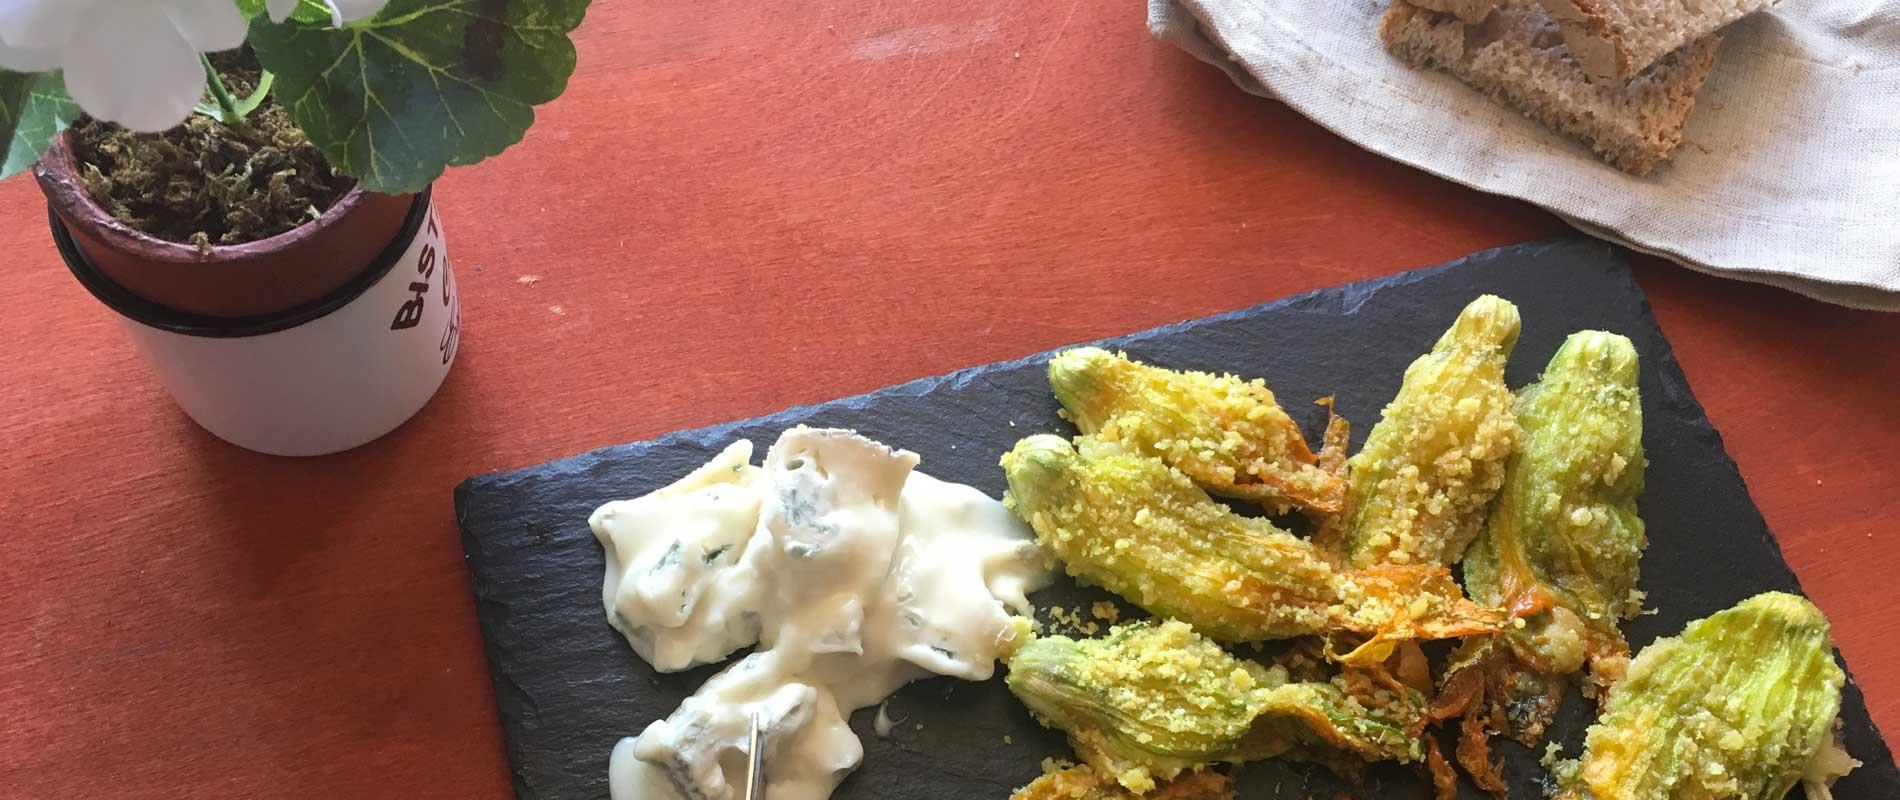 Fiori di zucca al Gorgonzola